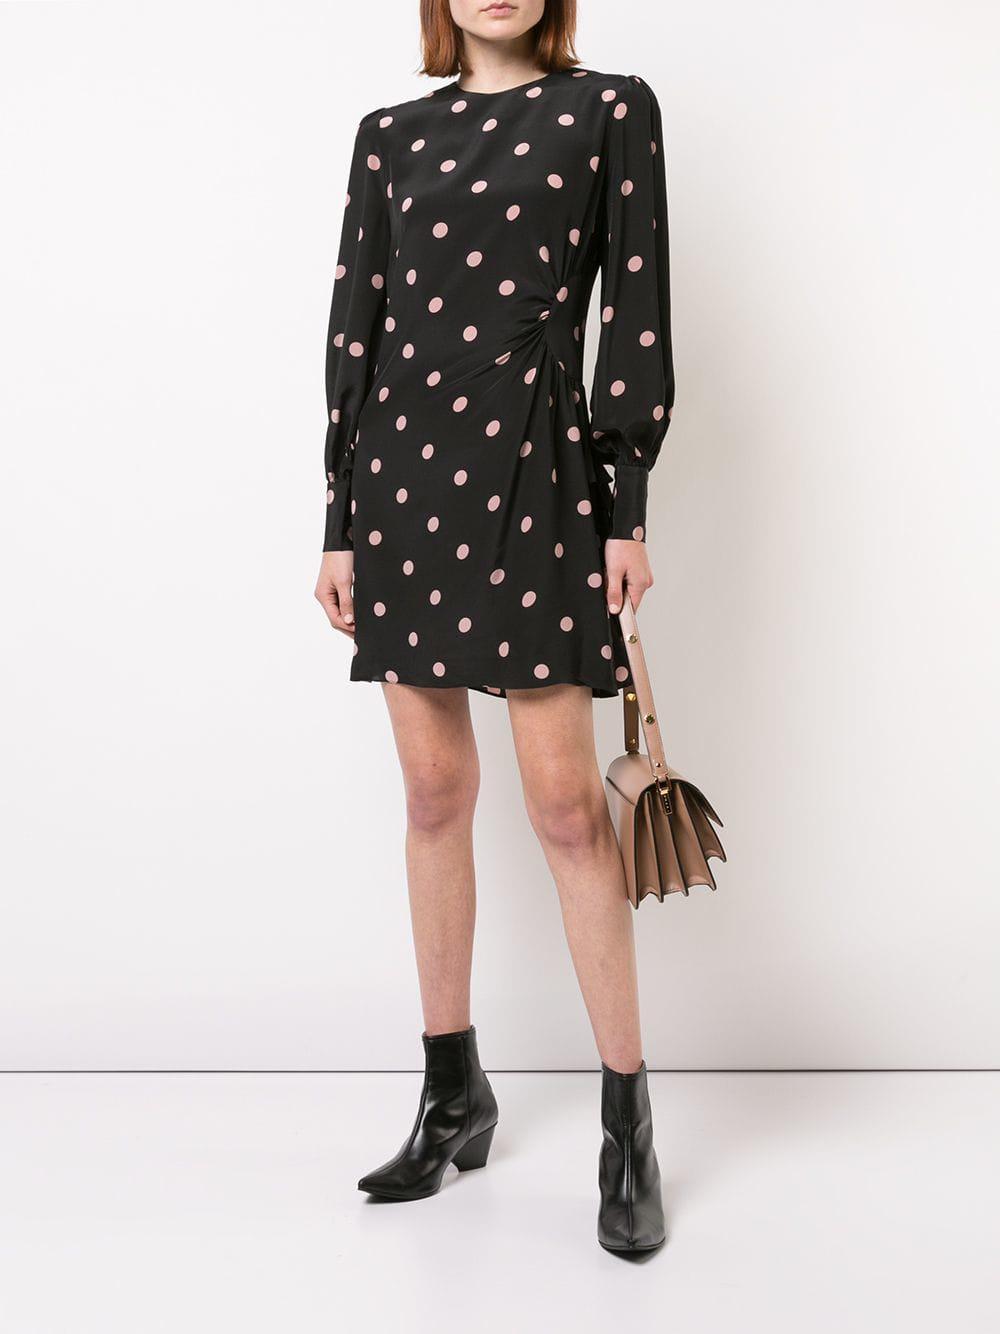 4fe0599358 Zimmermann Polka Dot Mini Dress in Black - Lyst